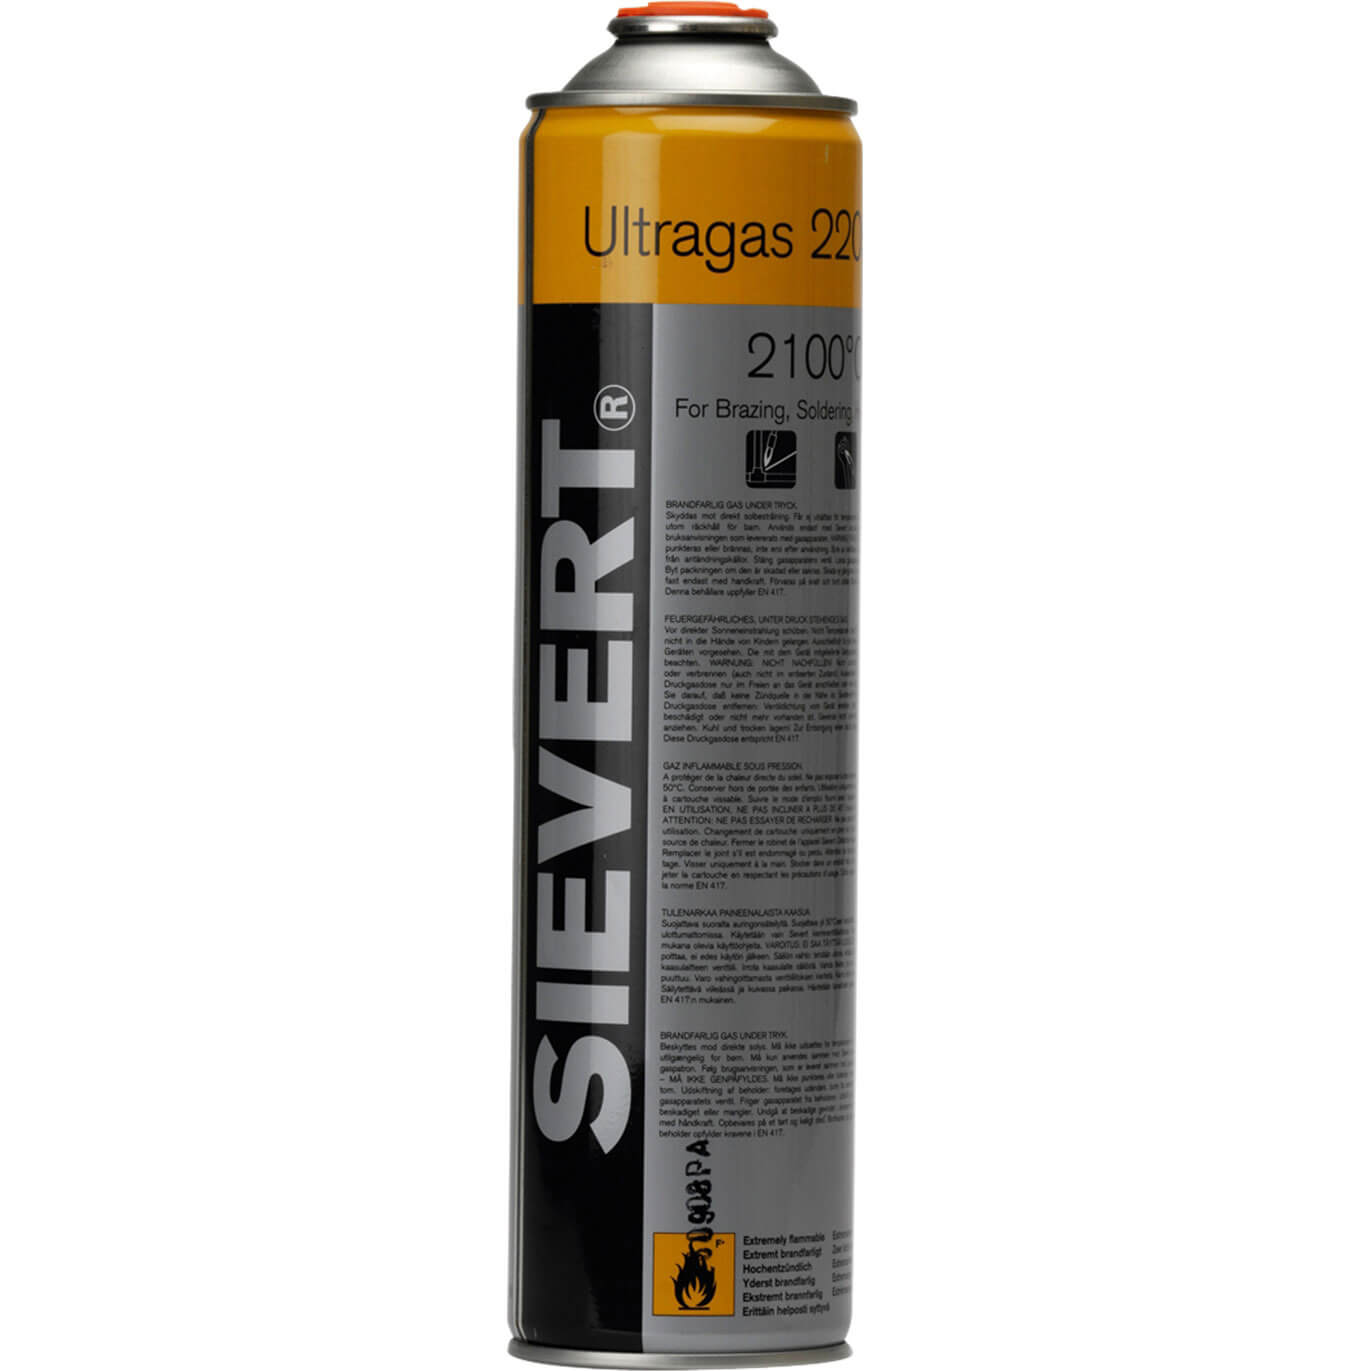 Image of Sievert 2205 Ultragas Cartridge 210g